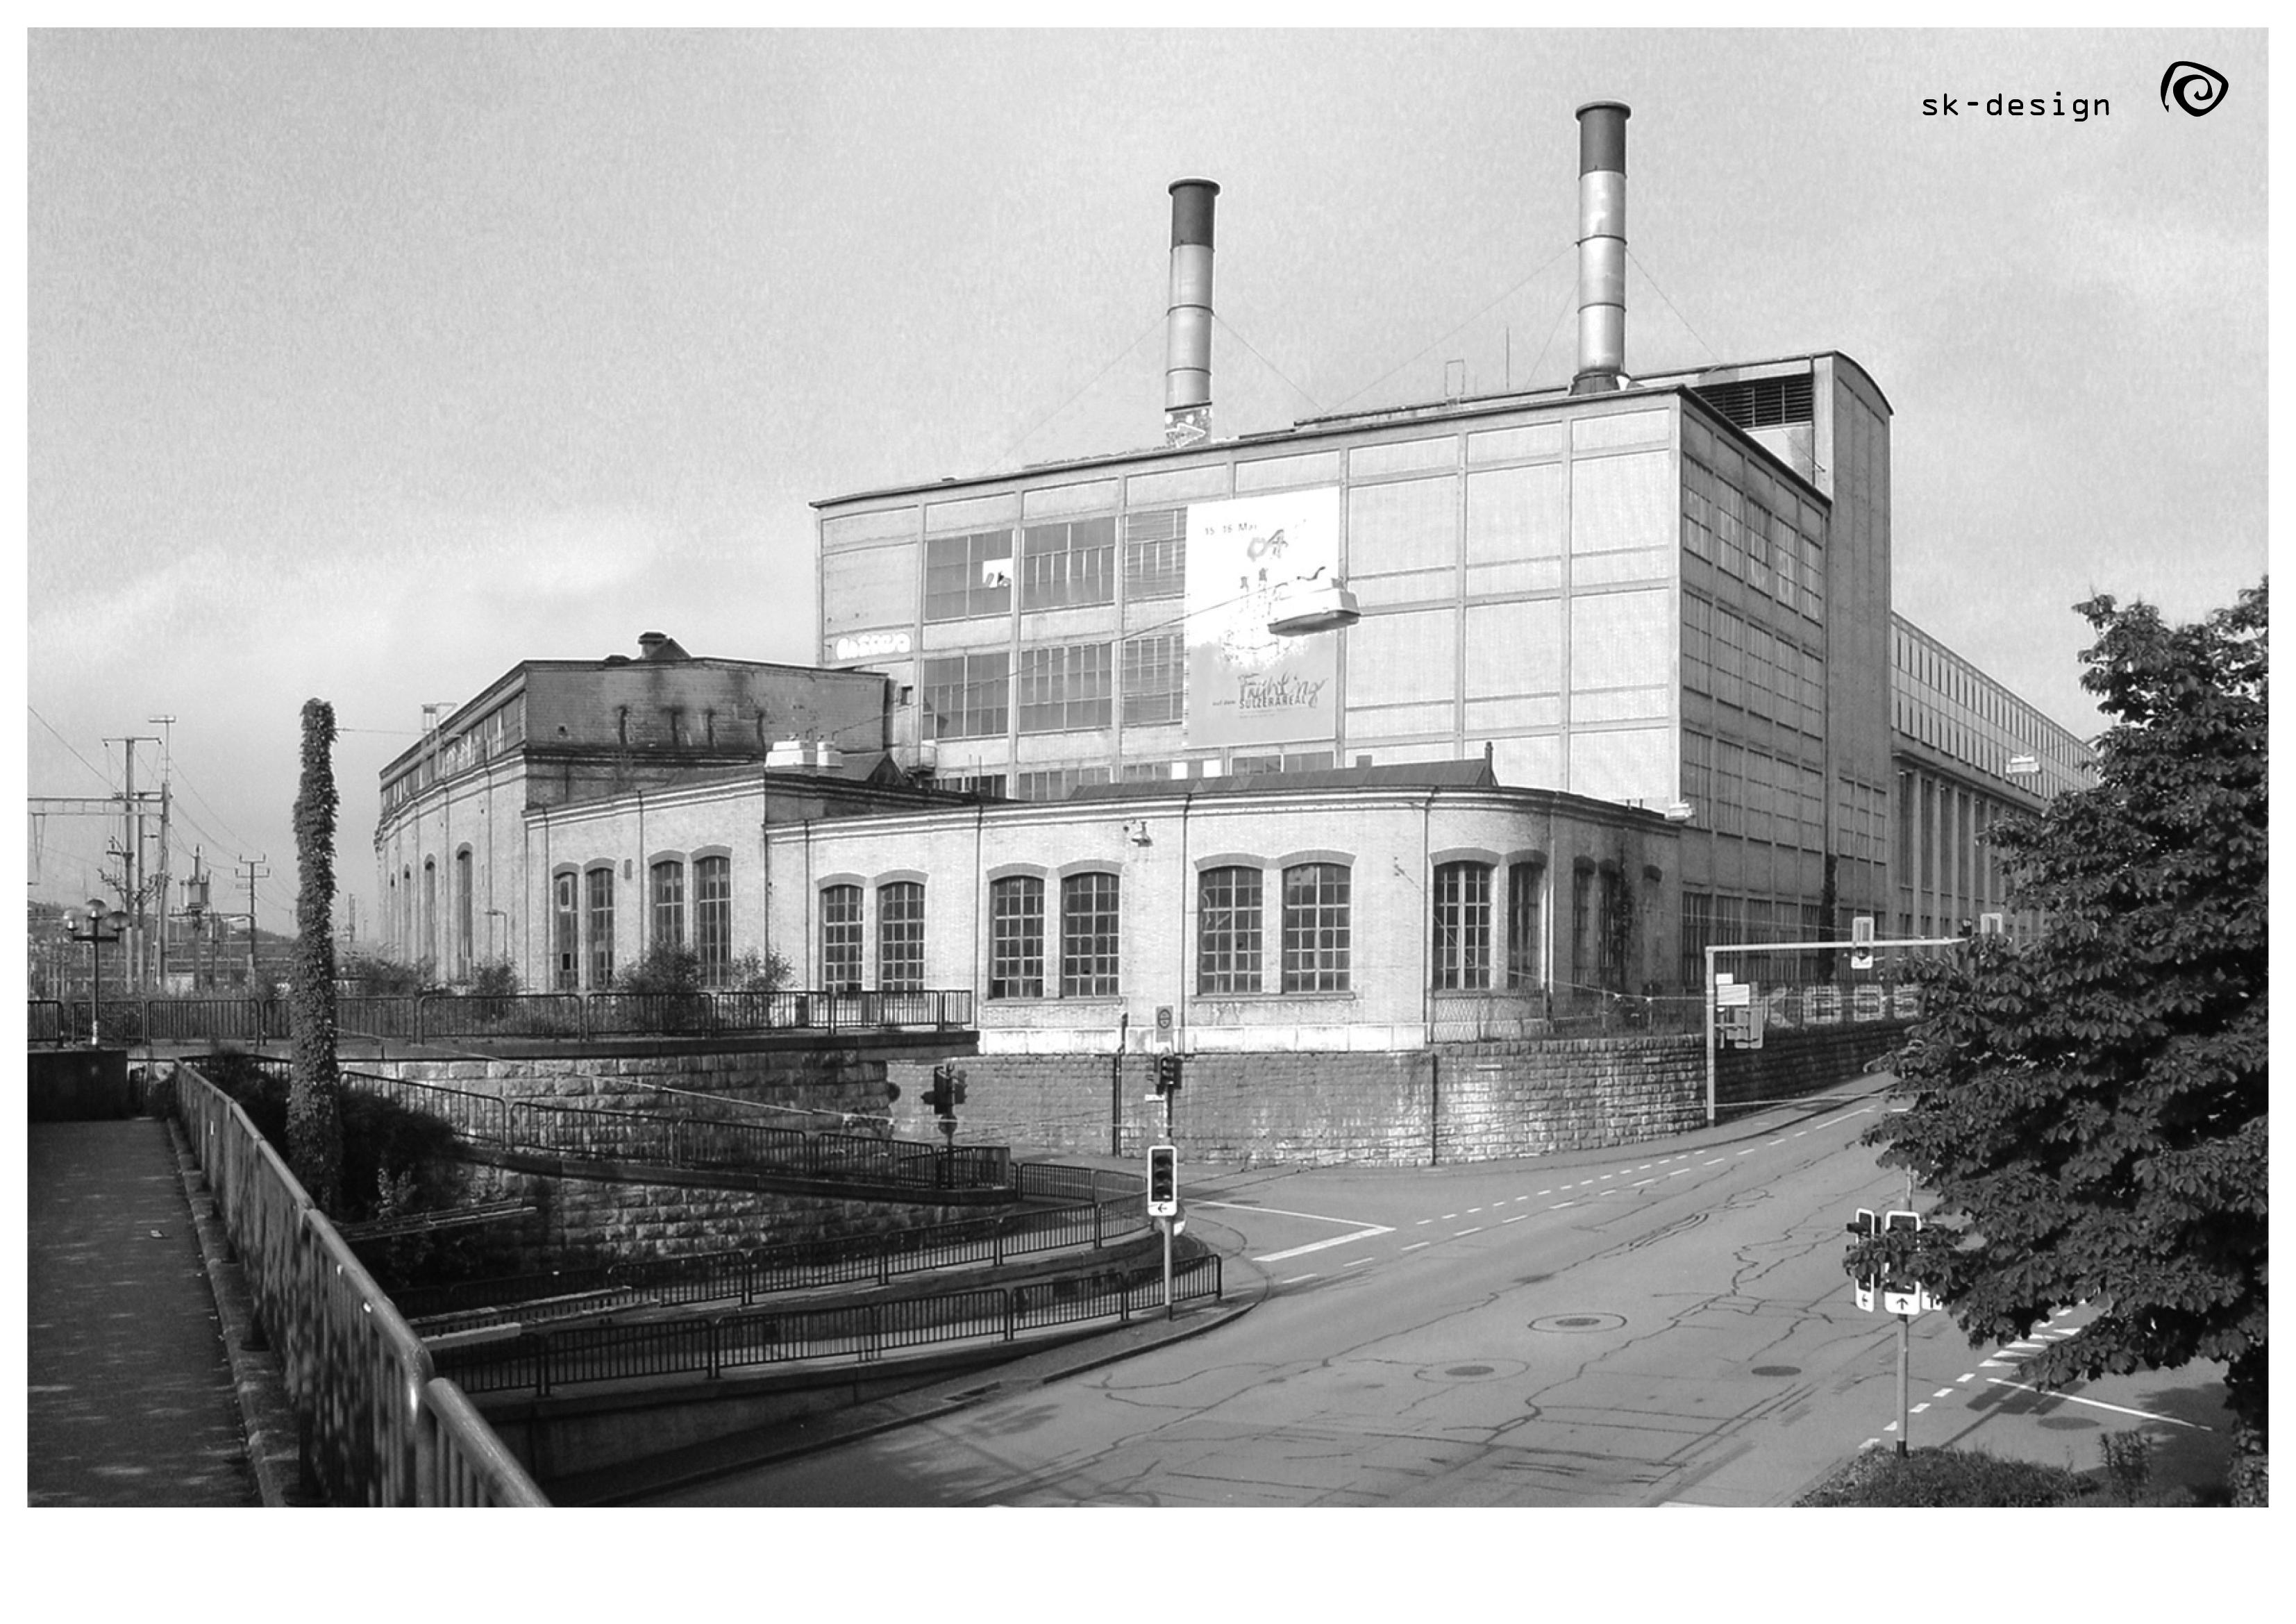 1409-Kesselhaus16.jpg